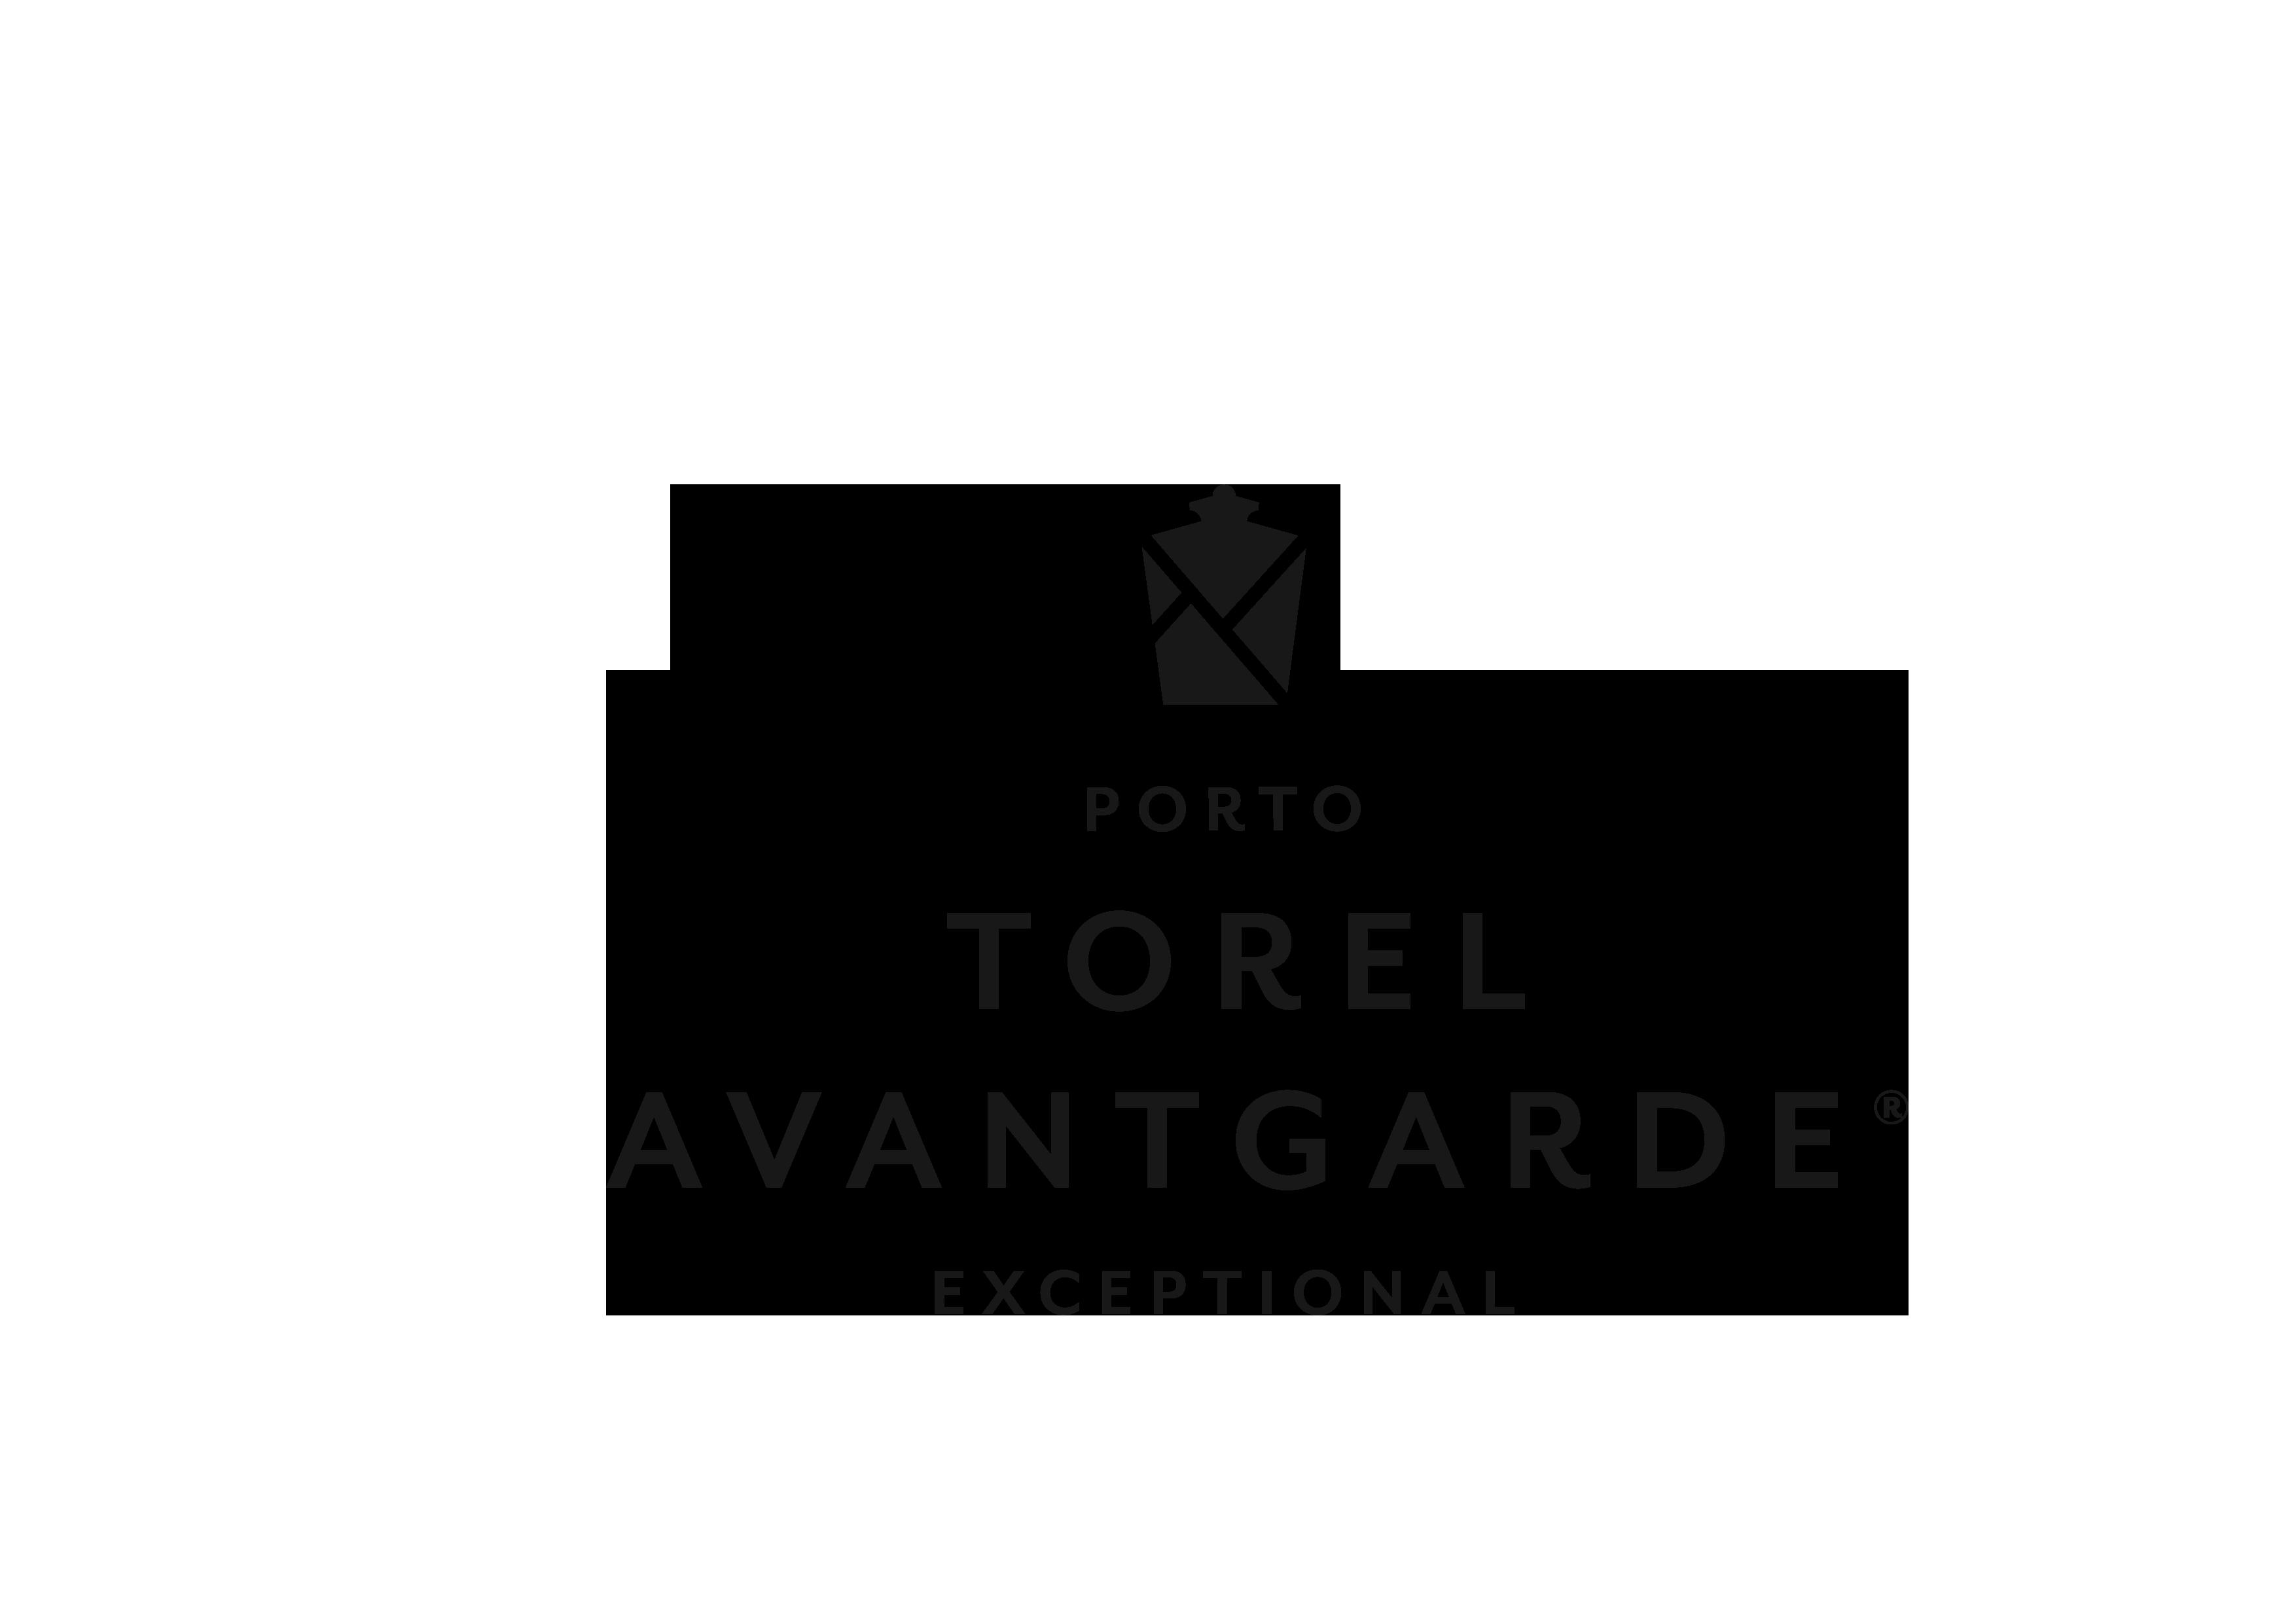 Logo-TOREL-avantgarde-8